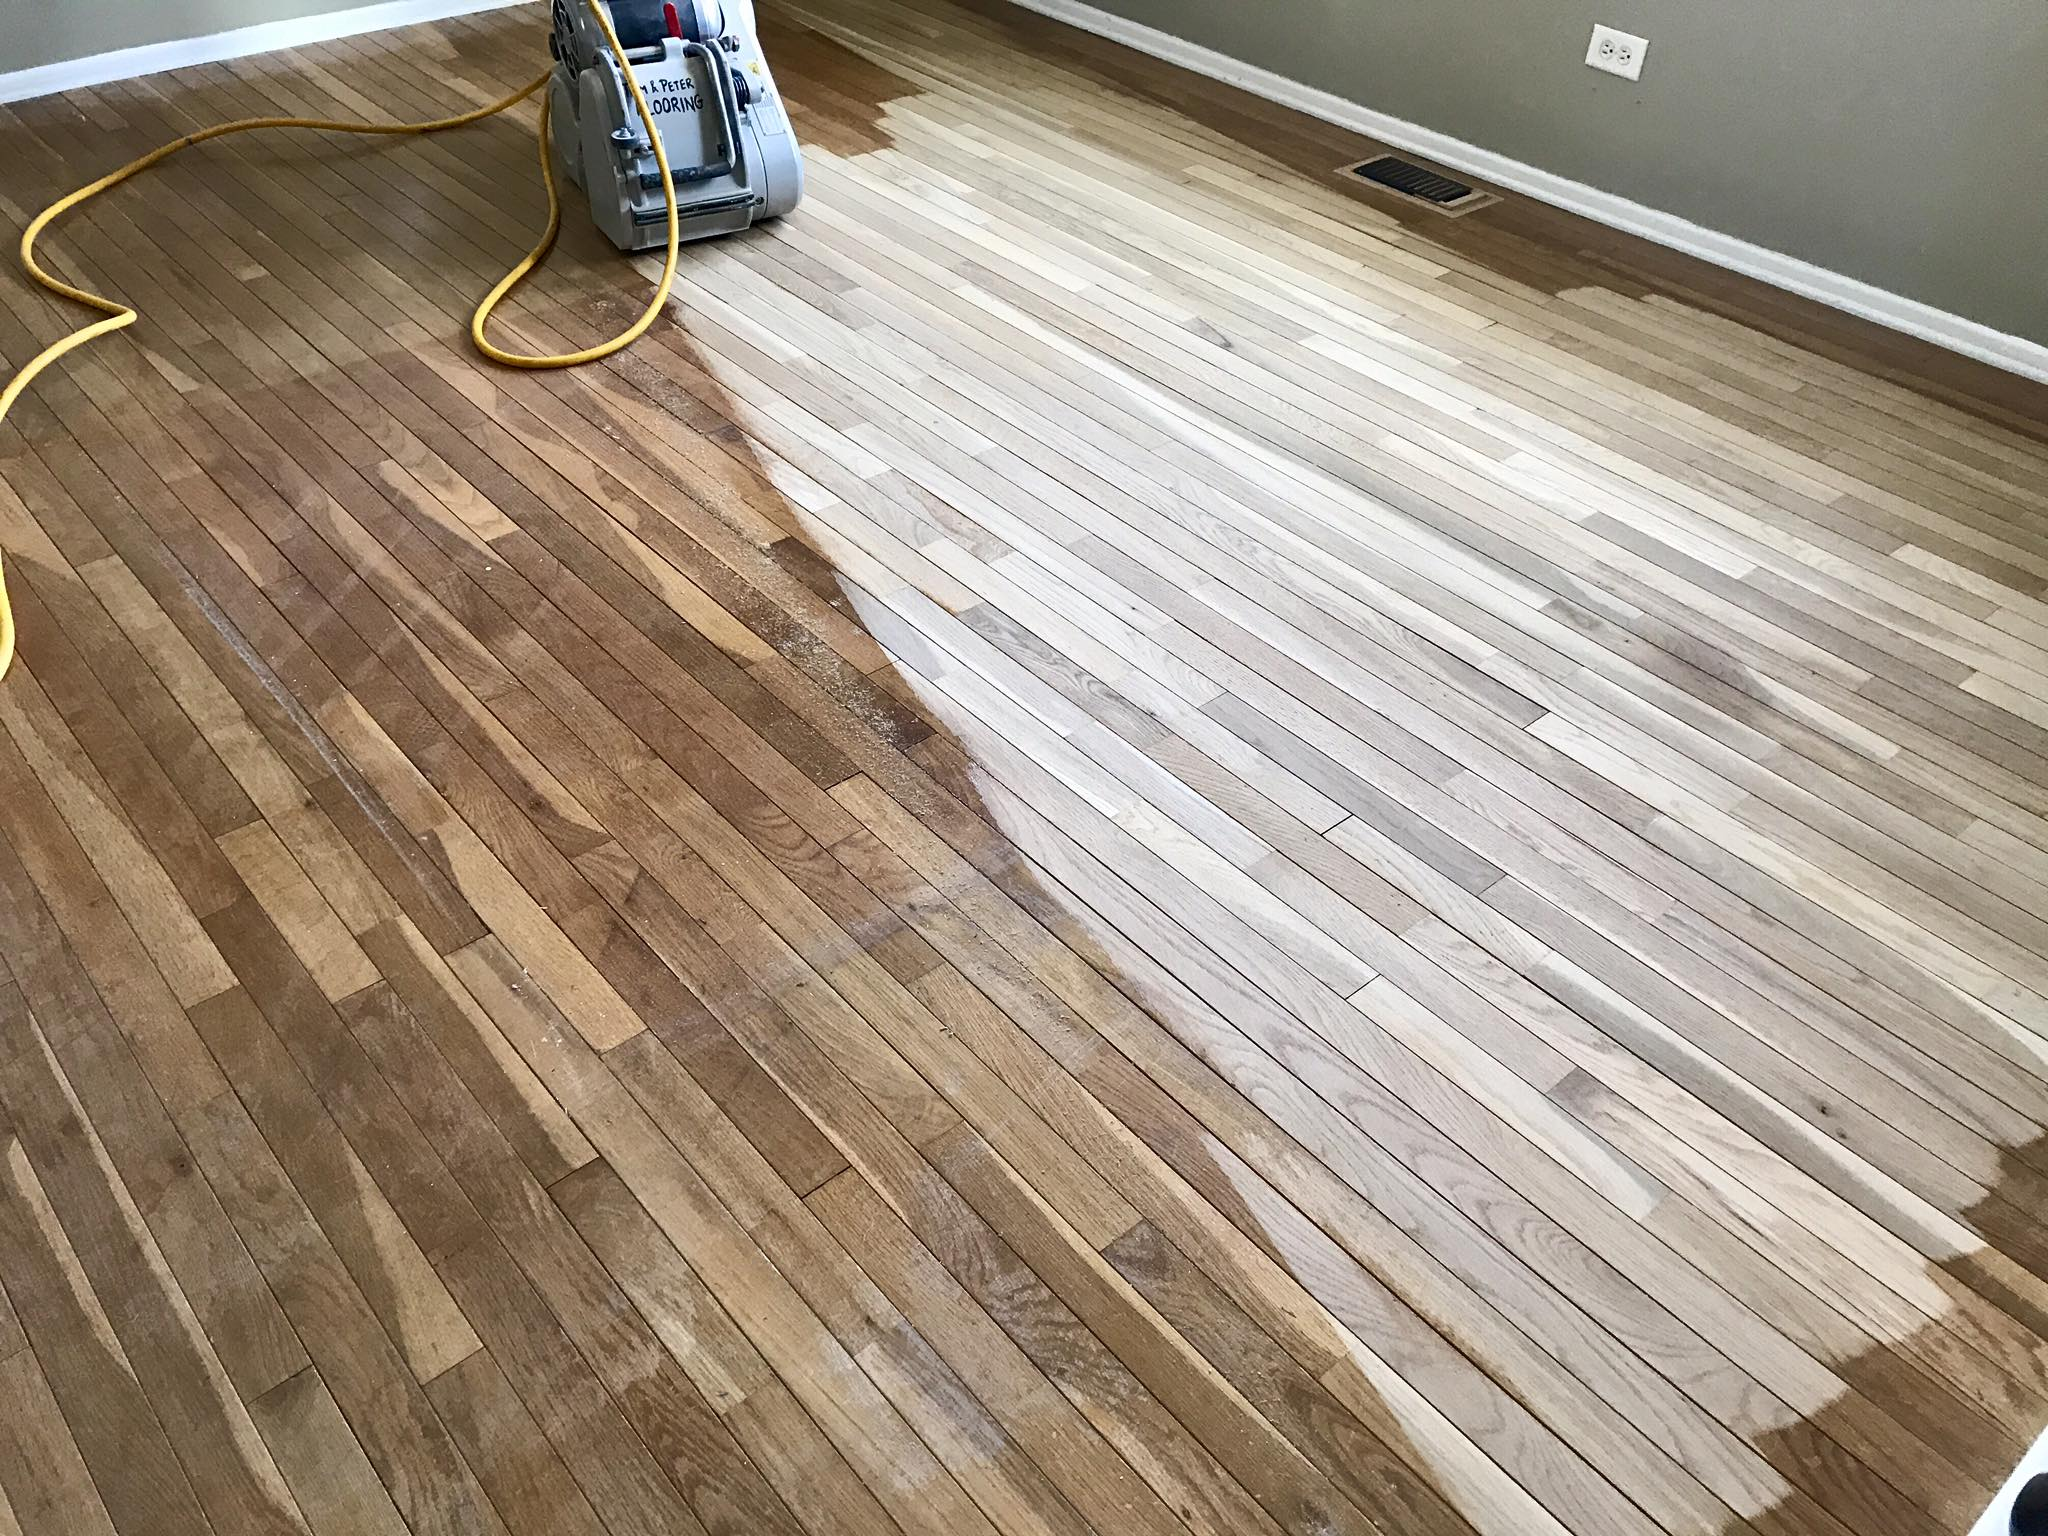 Dustless Sanding Hardwood Floor In Hoffman Estates Tom  Peter - Dustless hardwood floors